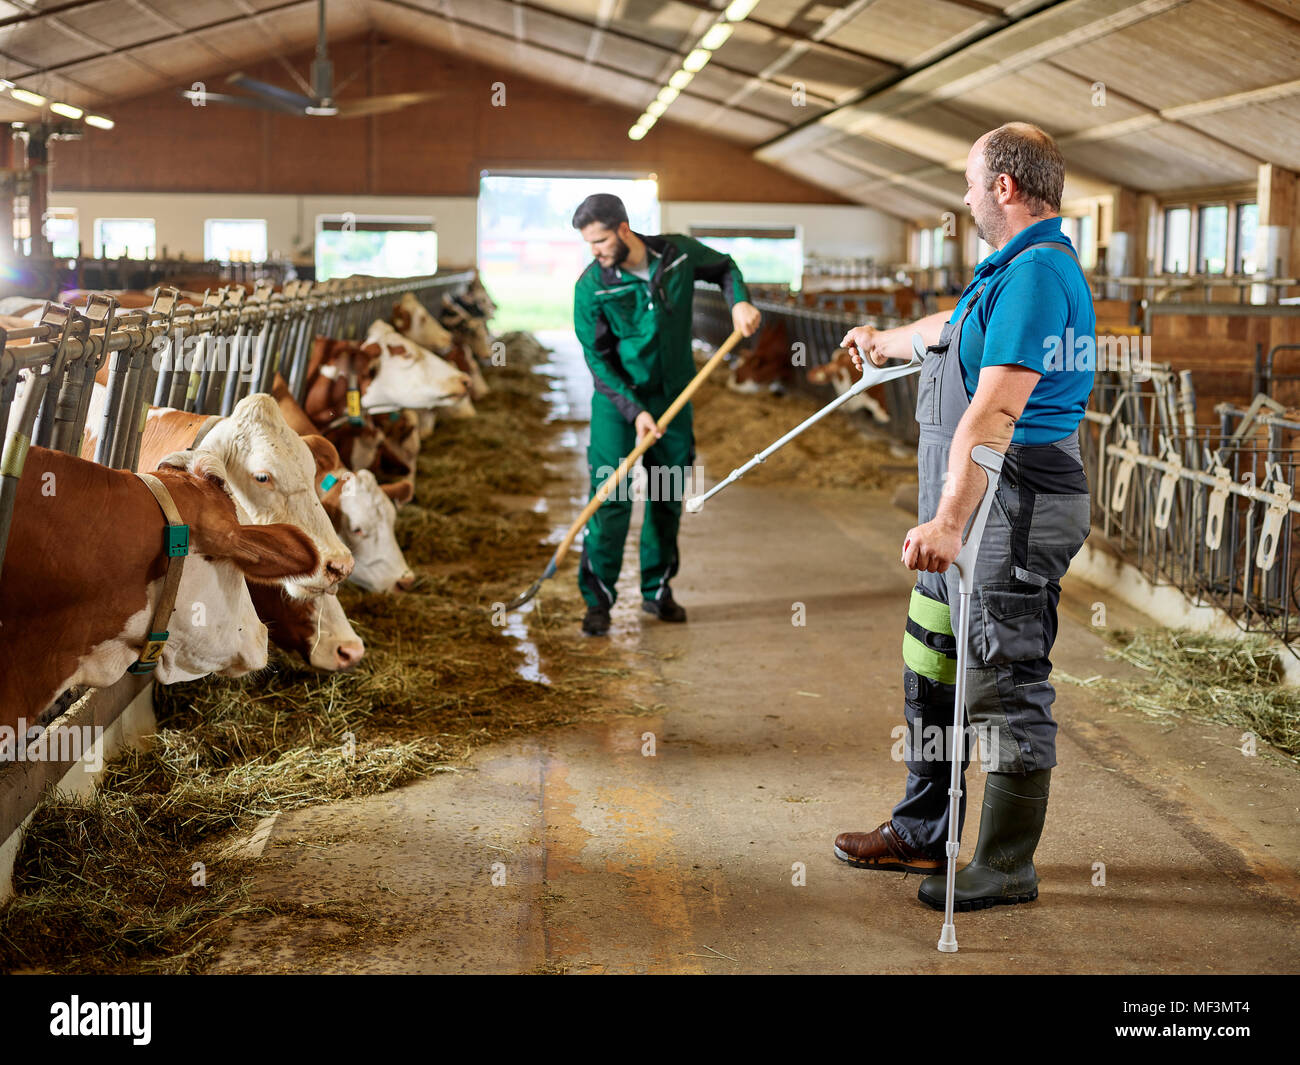 Farmer on crutches guiding man feeding cows in stable on a farm - Stock Image